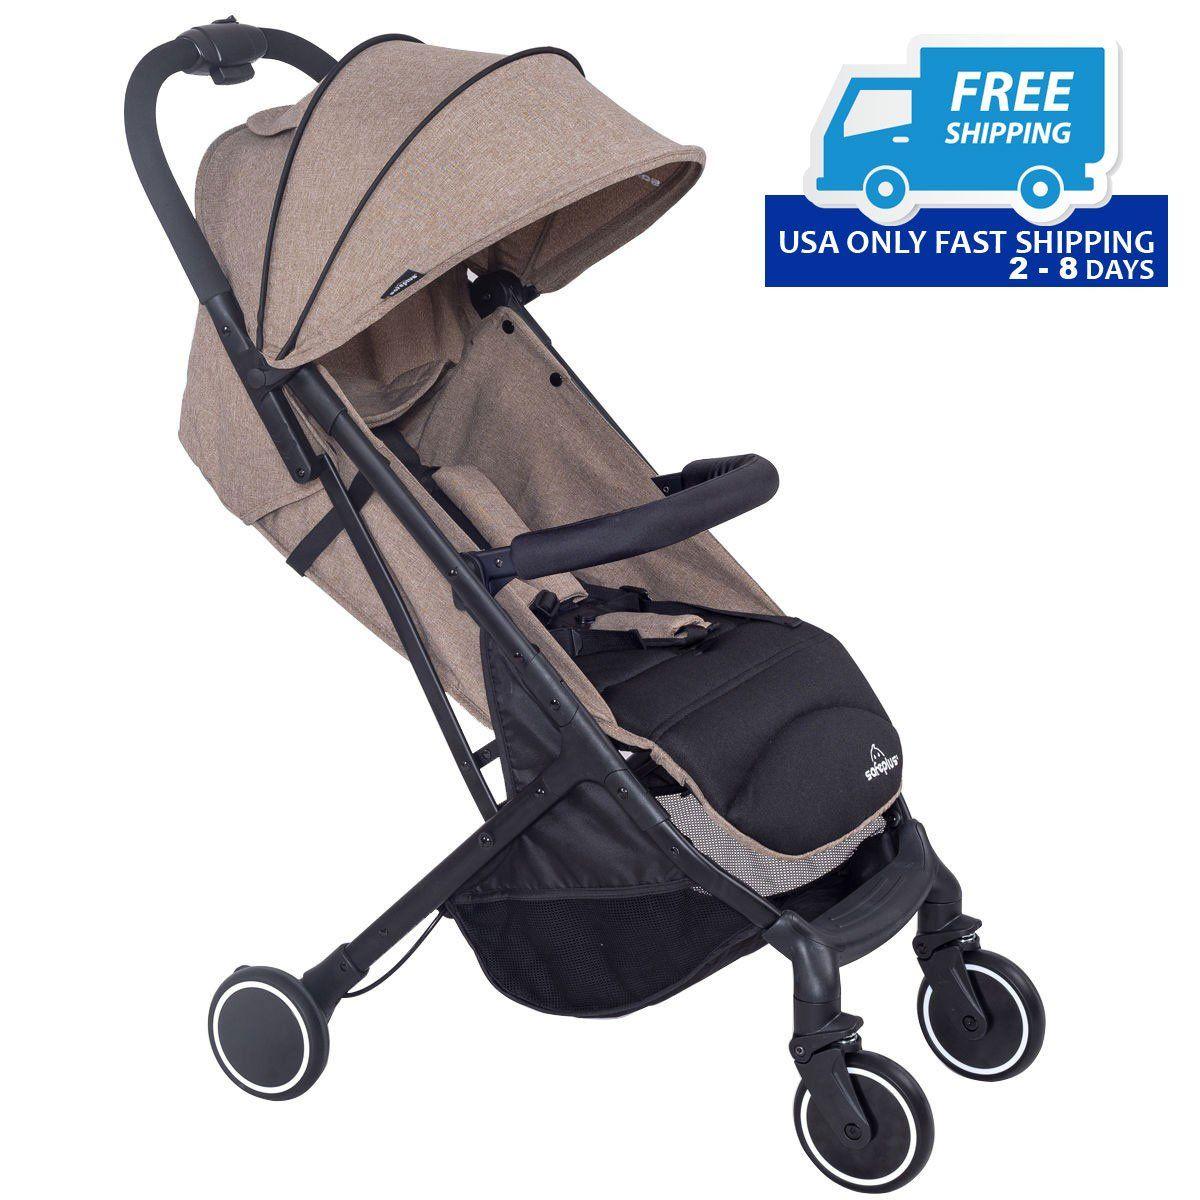 Foldable Lightweight Baby Travel Stroller Travel